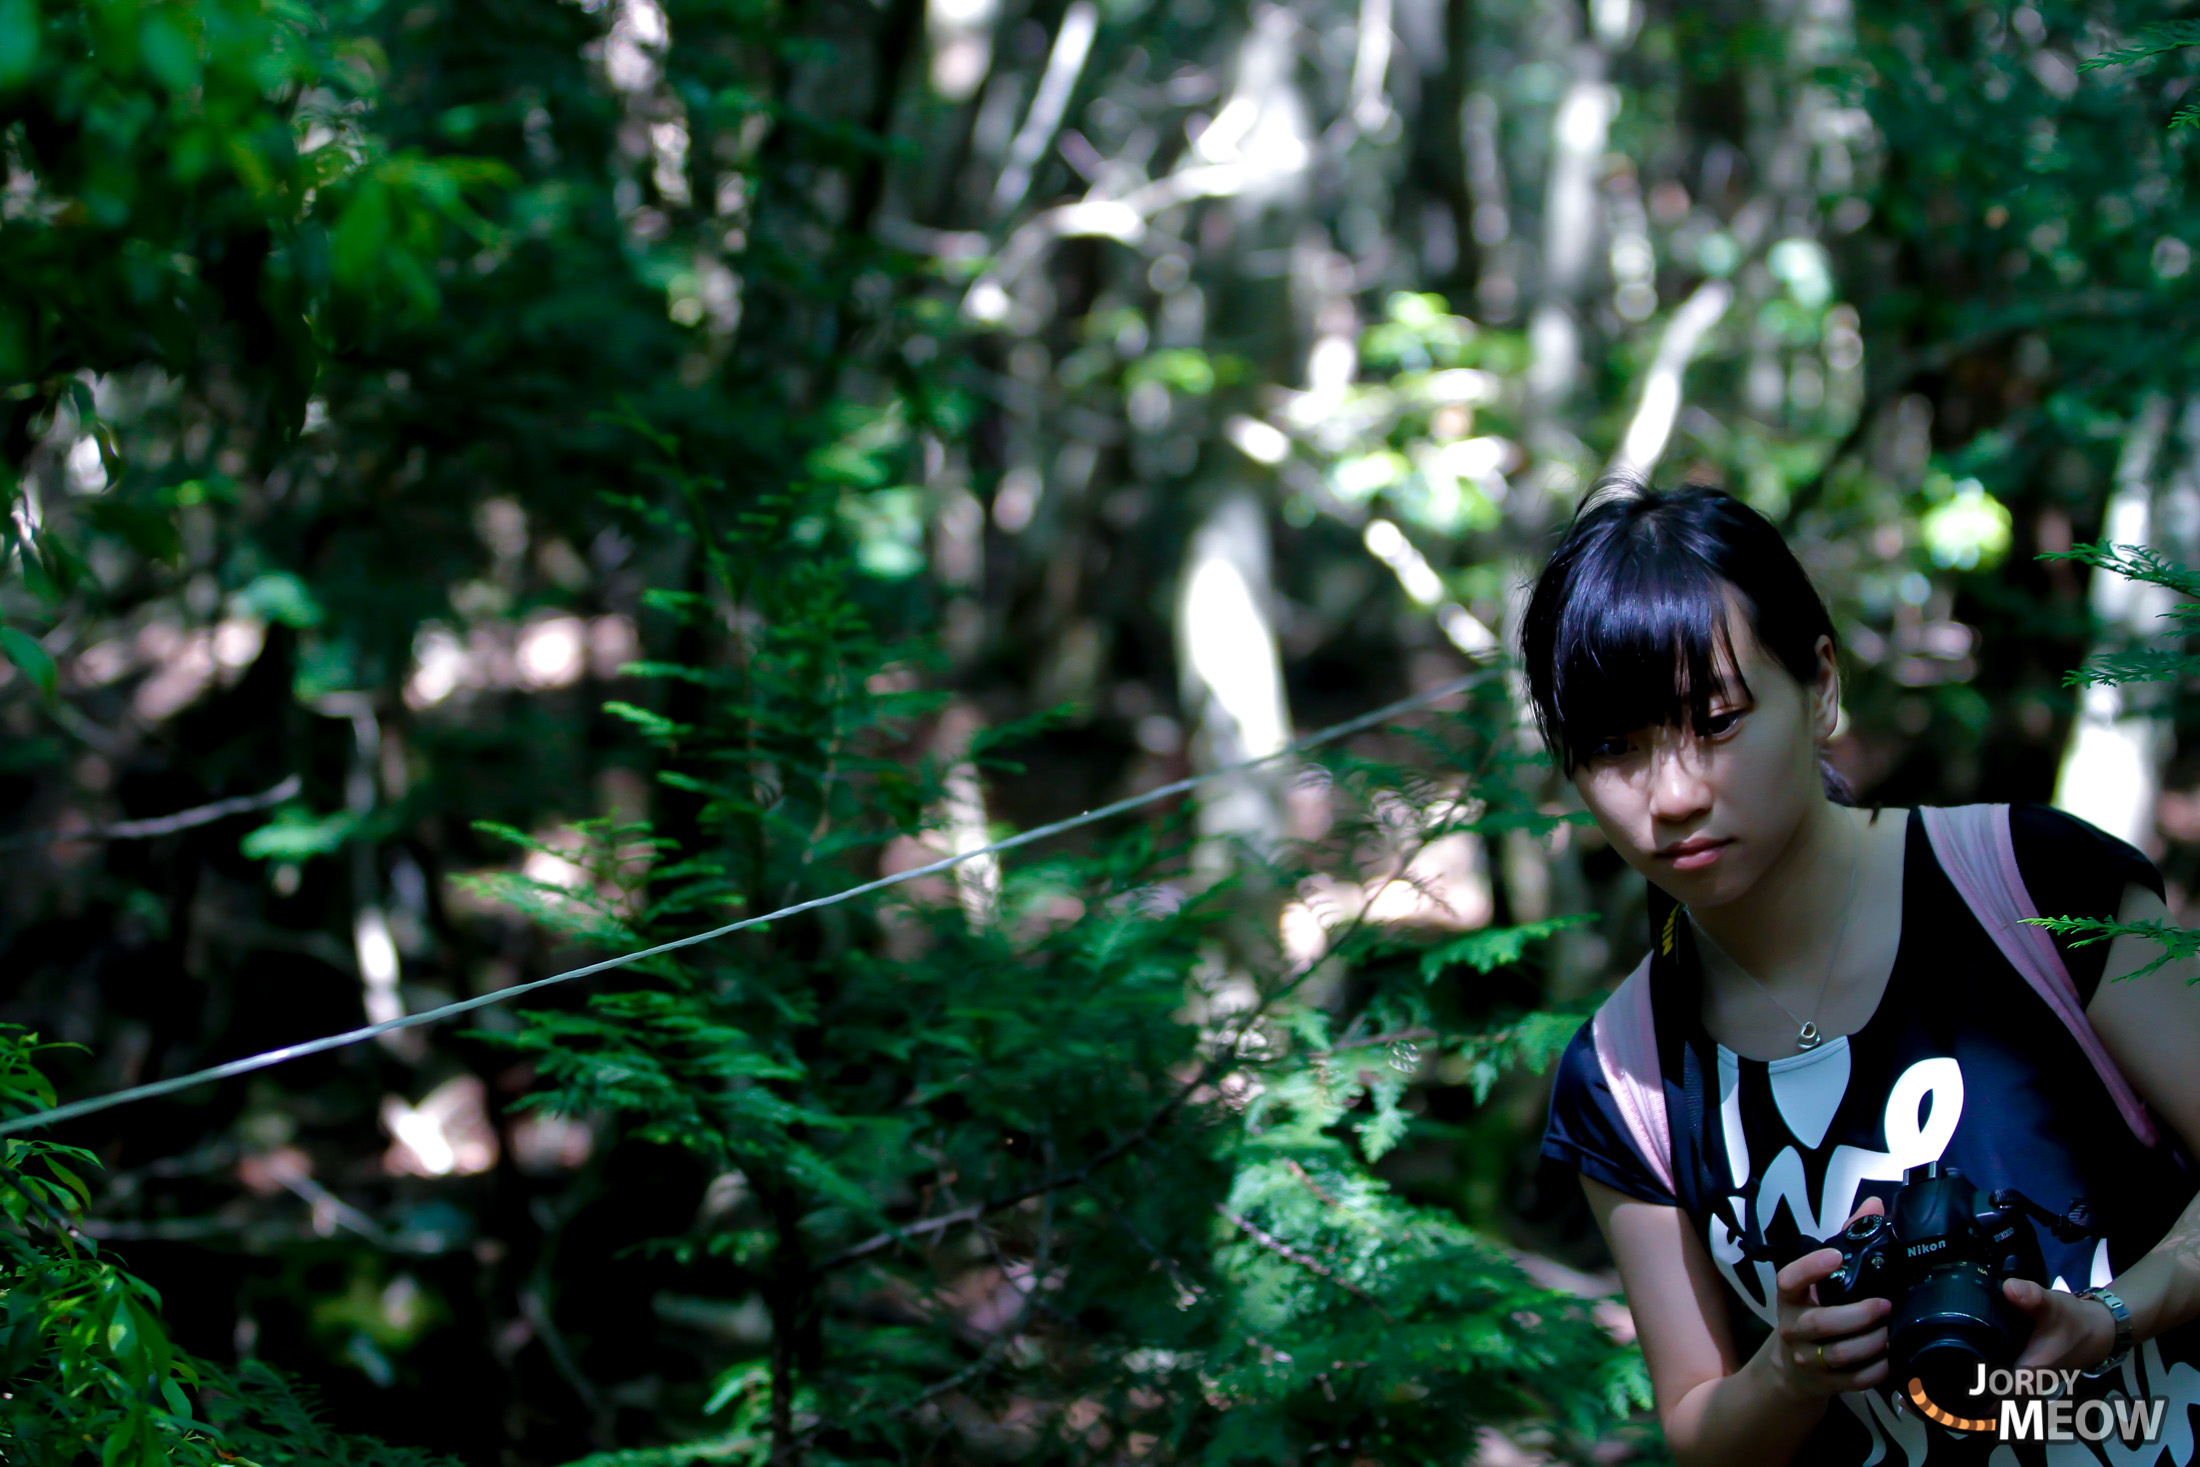 Jing, aokigahara, chinese, chubu, forest, japan, japanese, natural, nature, people, yamanashi